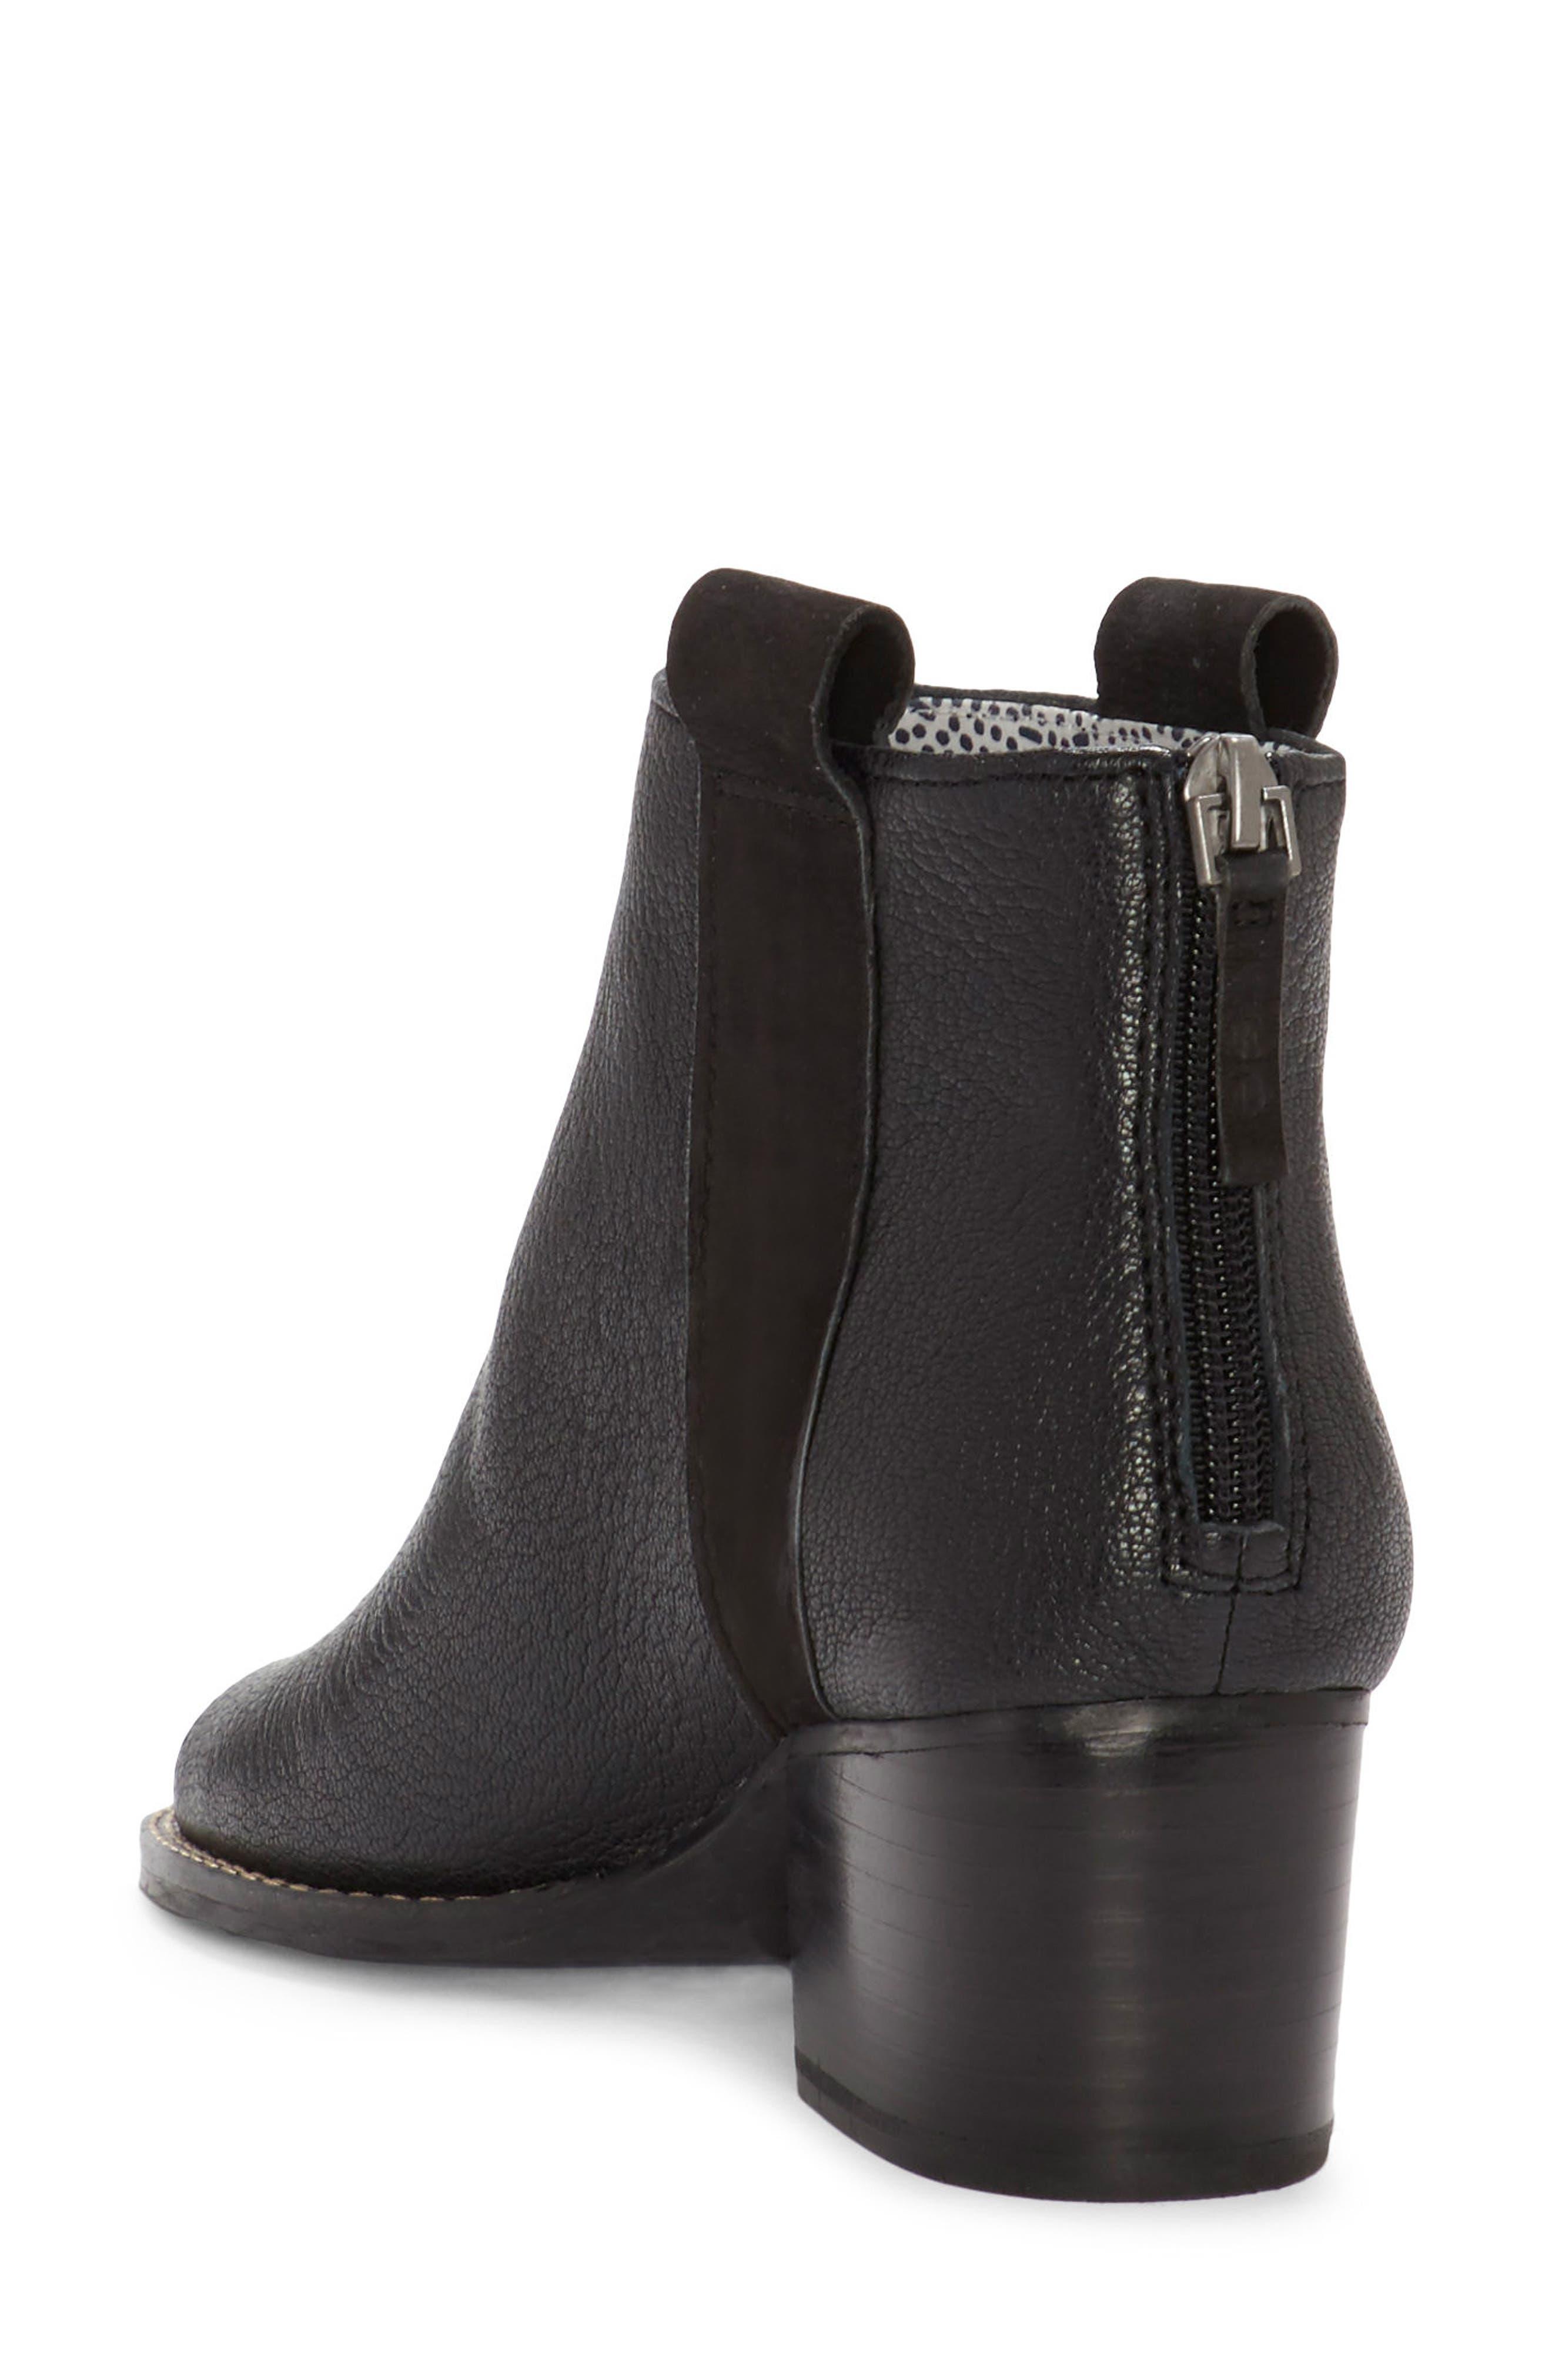 Taromi Peep Toe Bootie,                             Alternate thumbnail 2, color,                             Black Leather